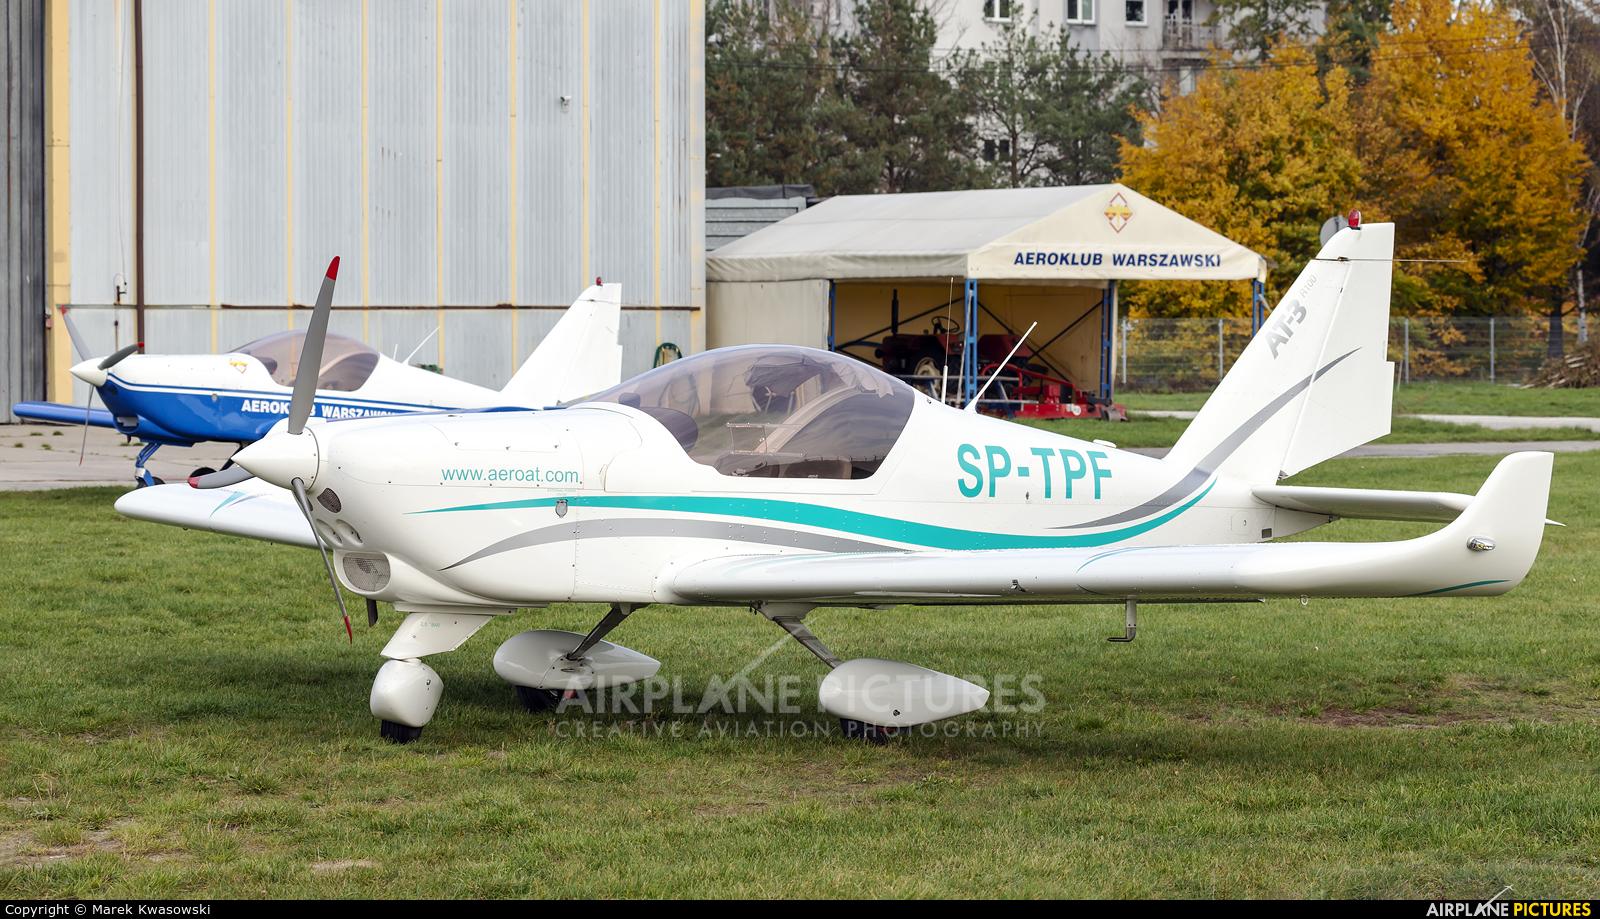 Aeroklub Warszawski SP-TPF aircraft at Warsaw - Babice